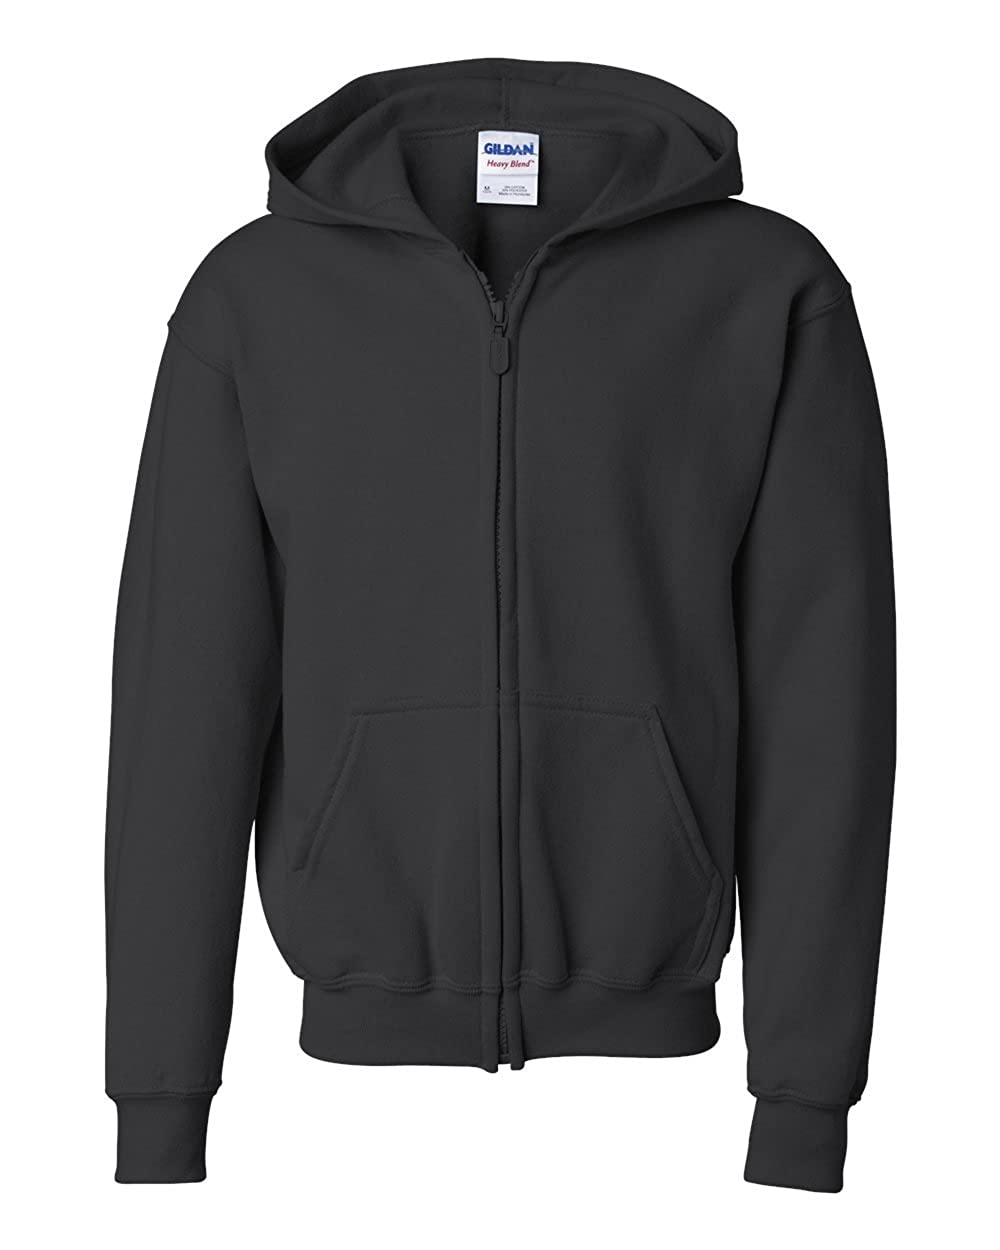 Gildan Heavy Blend Youth Full-Zip Hooded Sweatshirt